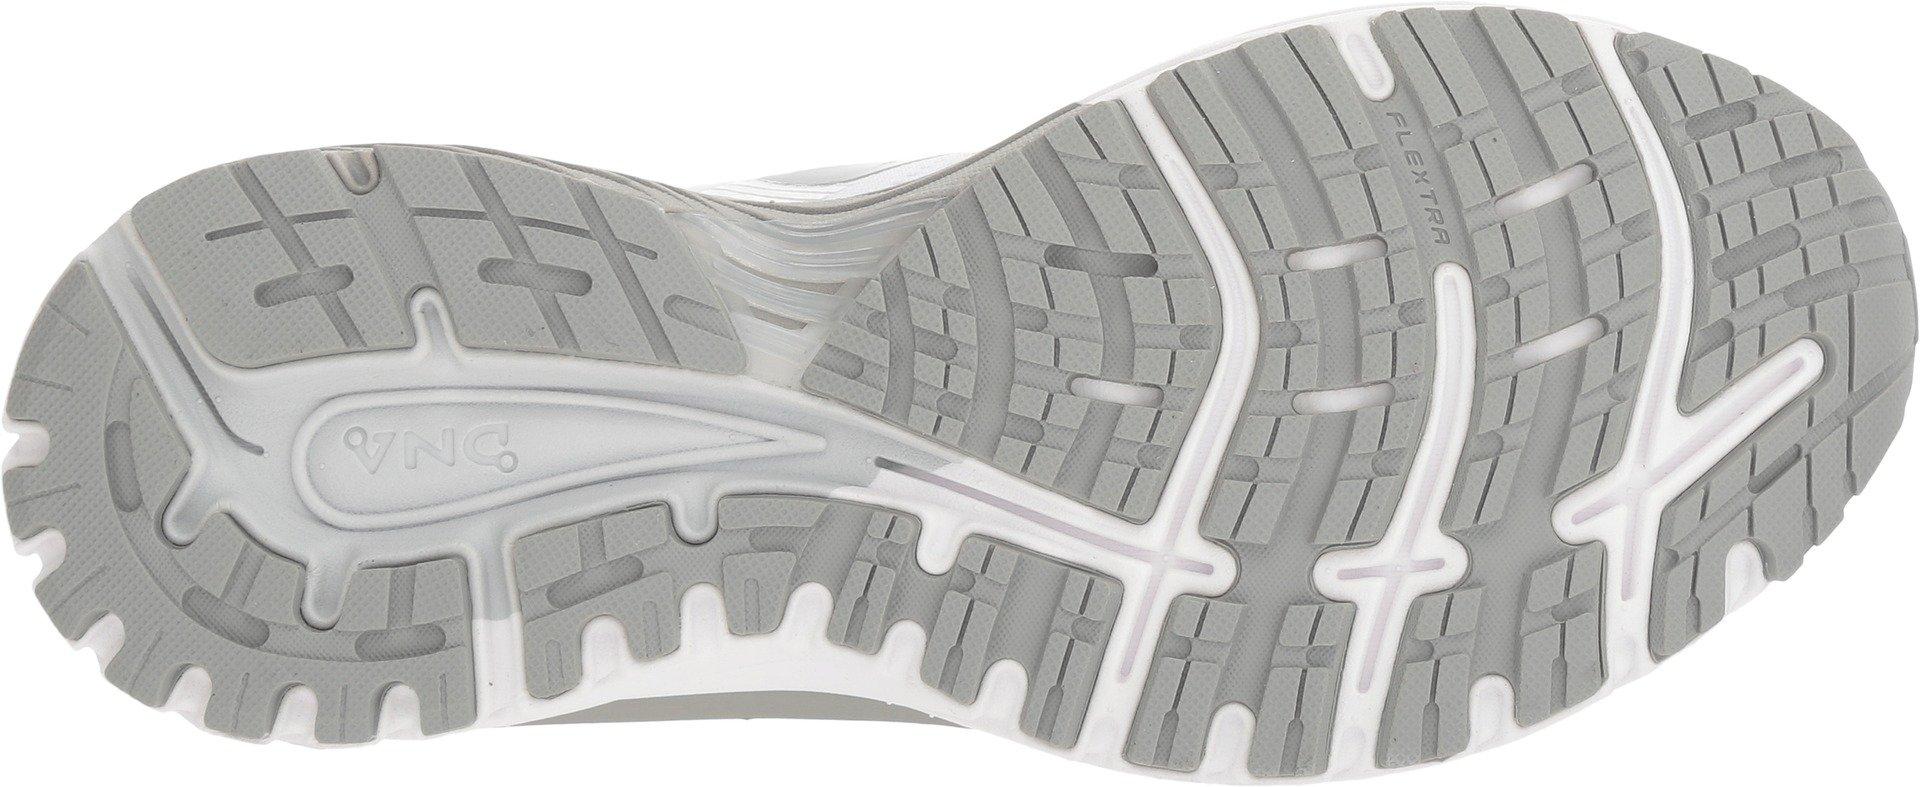 Brooks Women's Adrenaline GTS 18 White/White/Grey 5 D US by Brooks (Image #3)